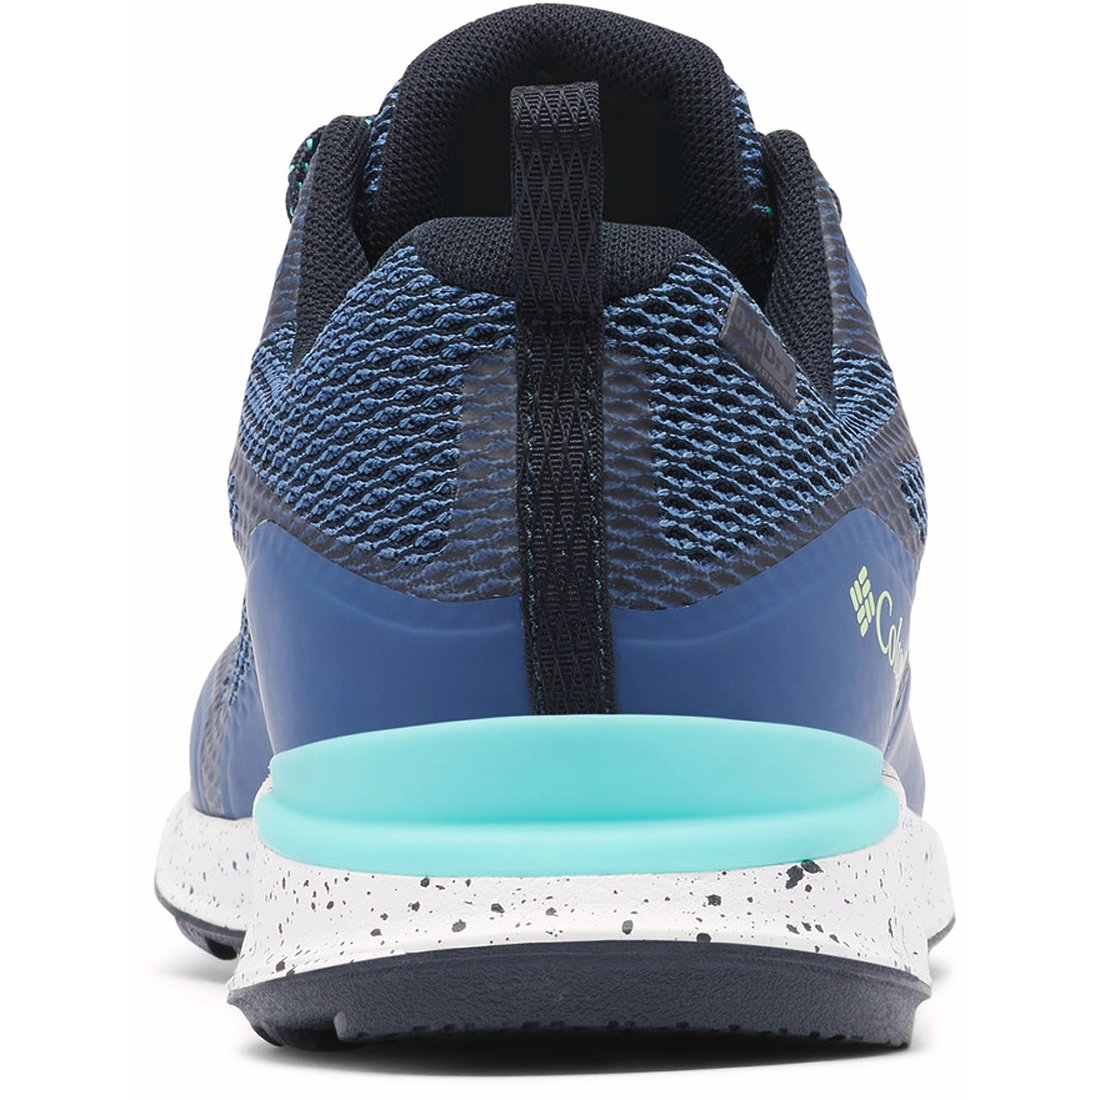 נעליי multi-sport לנשים - Vitesse Outdry - Columbia